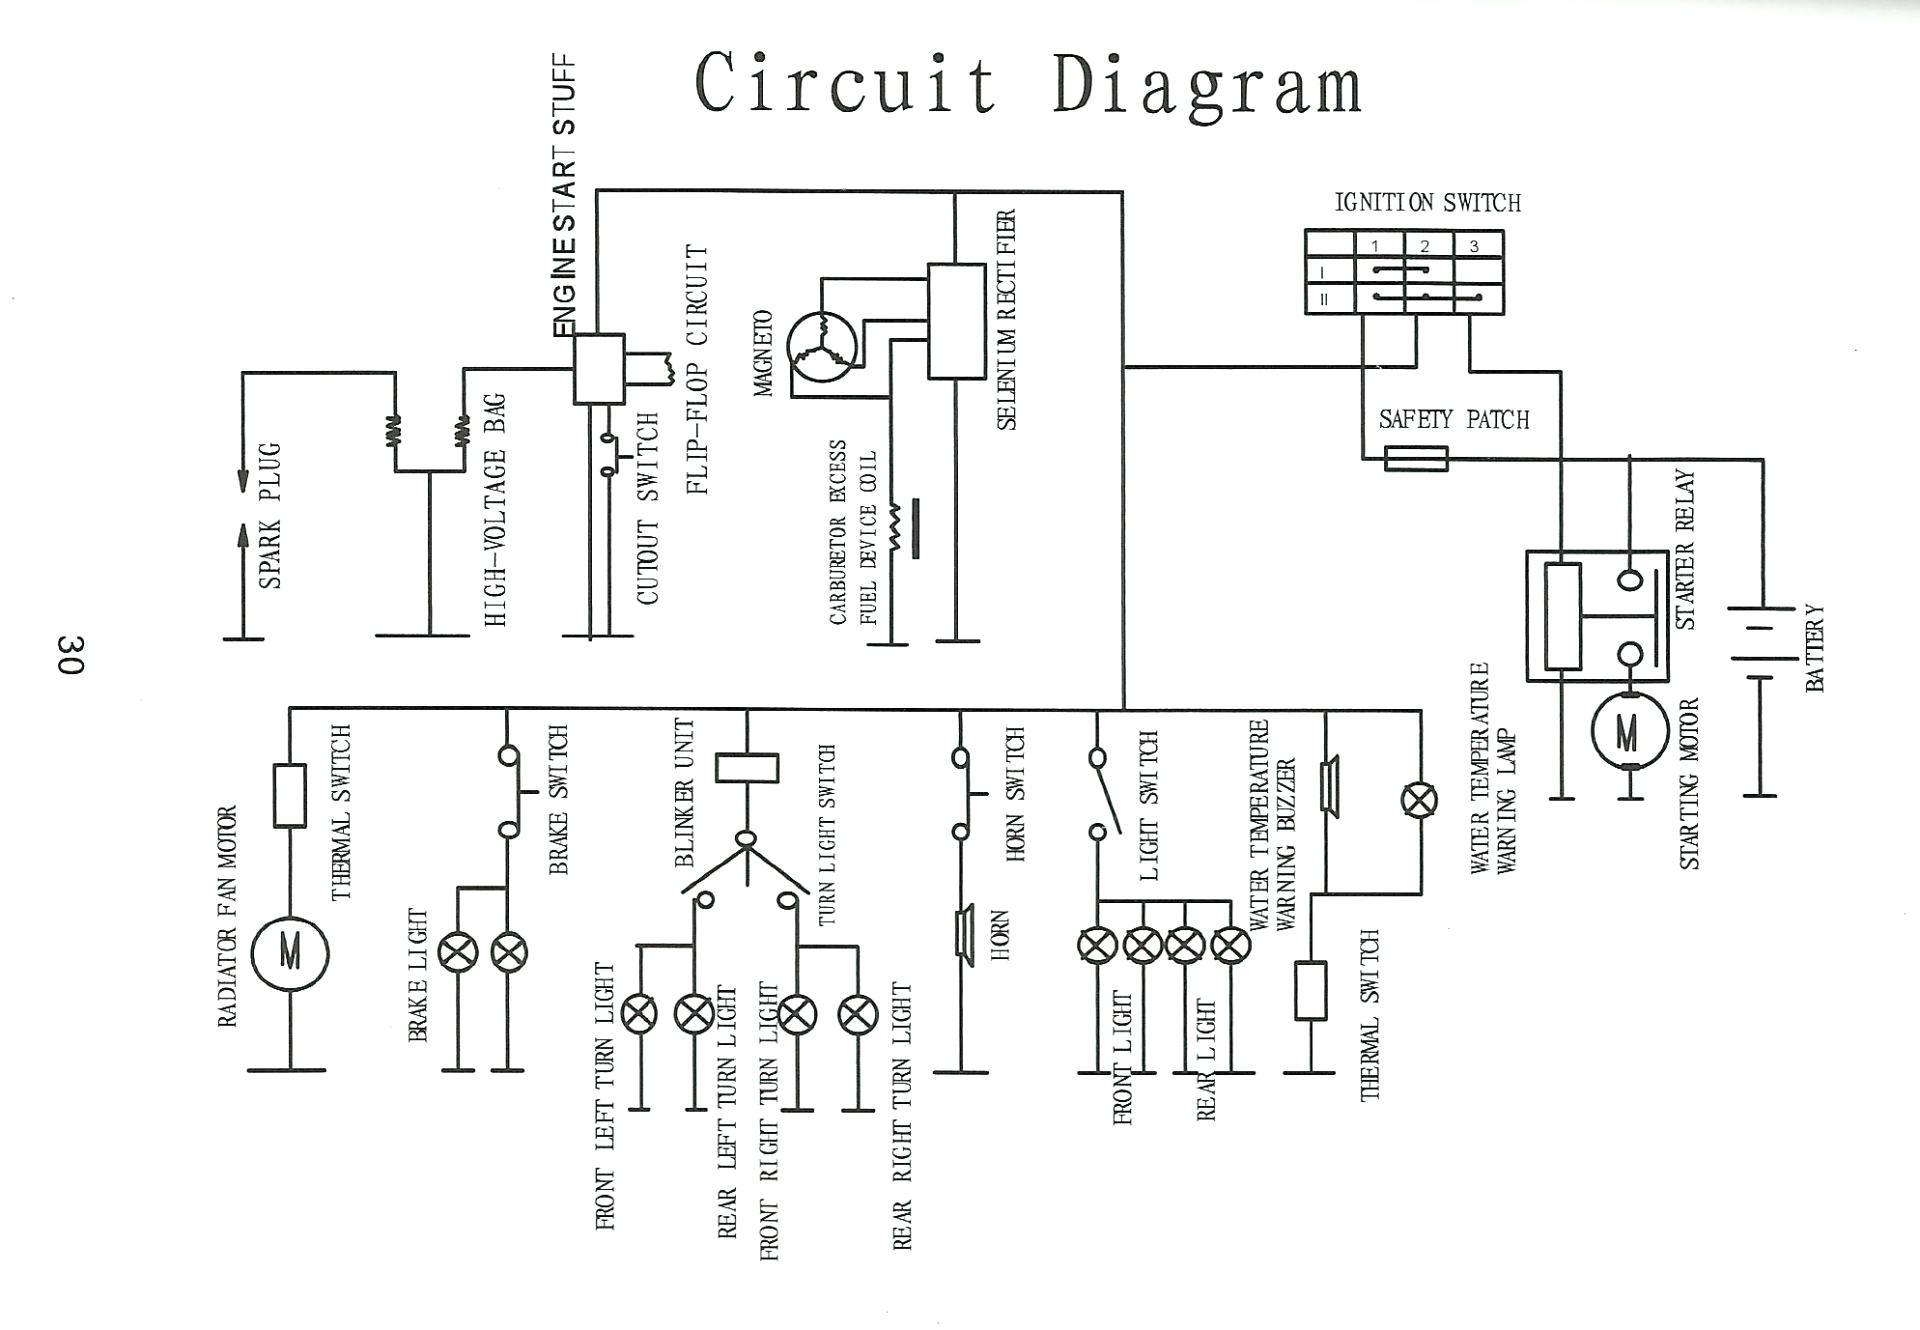 Kazuma Falcon 110 Wiring Diagram. 110cc 4 Wheeler Wiring ... on